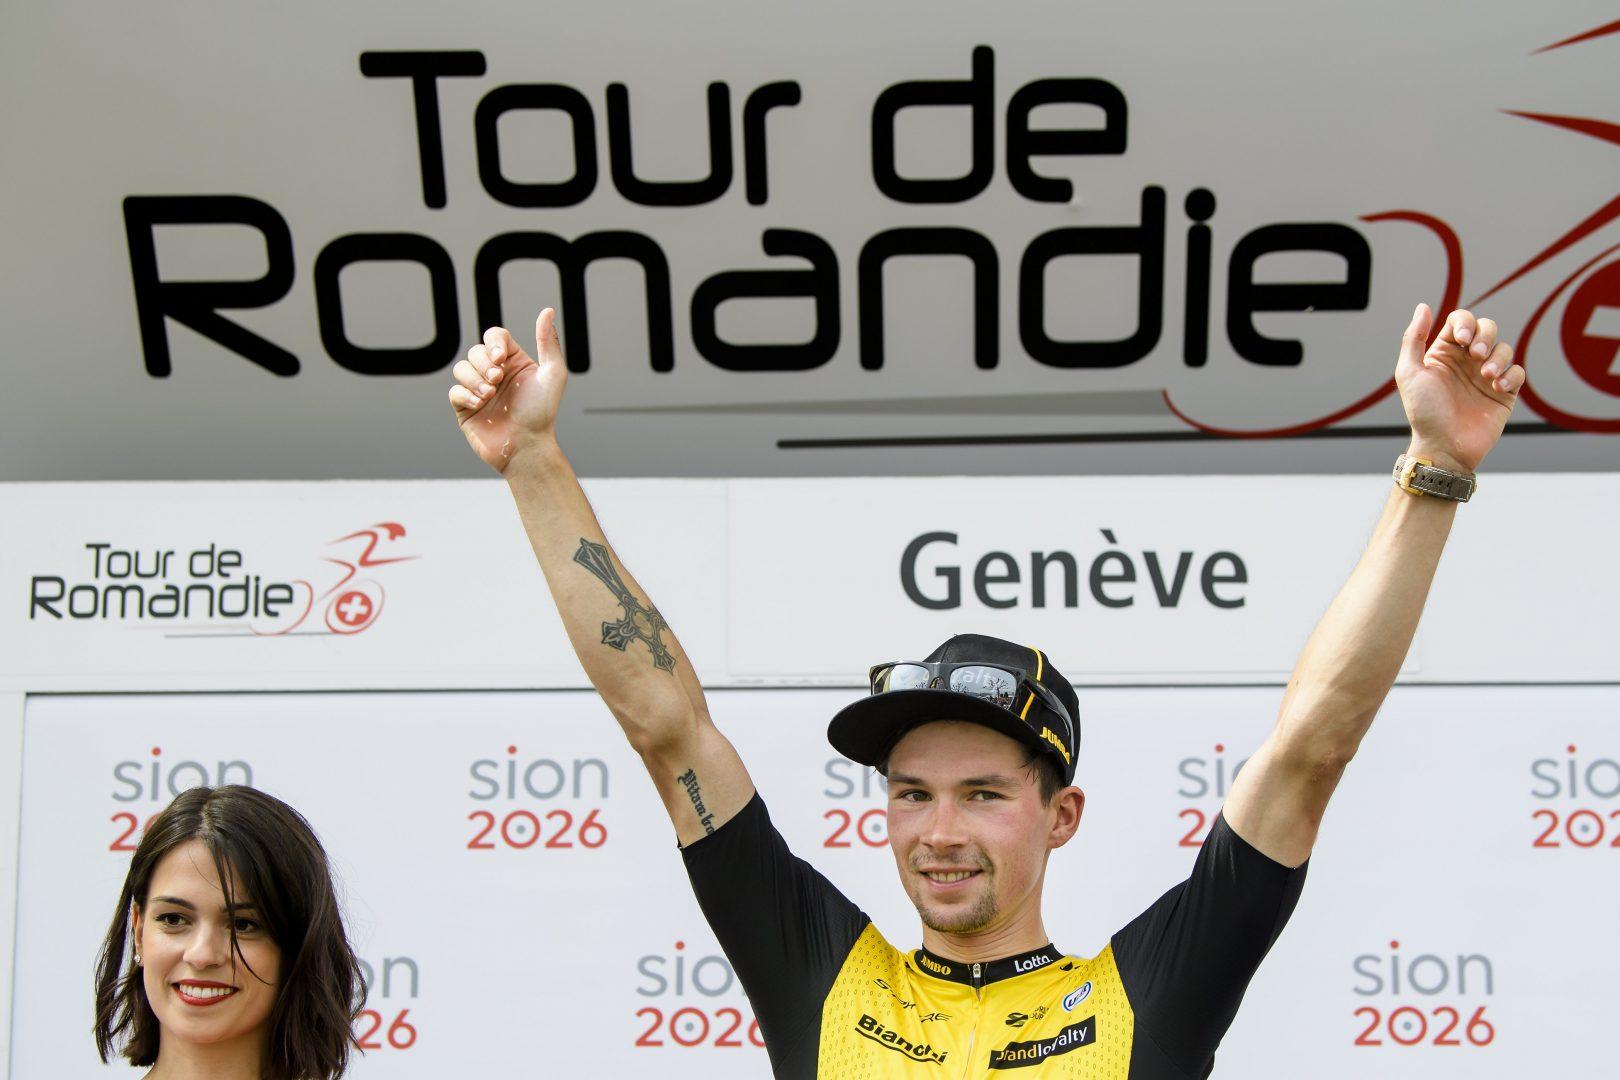 Primoz Roglic se proclamó este domingo vencedor final del Tour de Romandía con ocho segundos de ventaja sobre el colombiano Egan Bernal (Sky) al término de la quinta etapa. (Foto: EFE/EPA/JEAN-CHRISTOPHE BOTT)